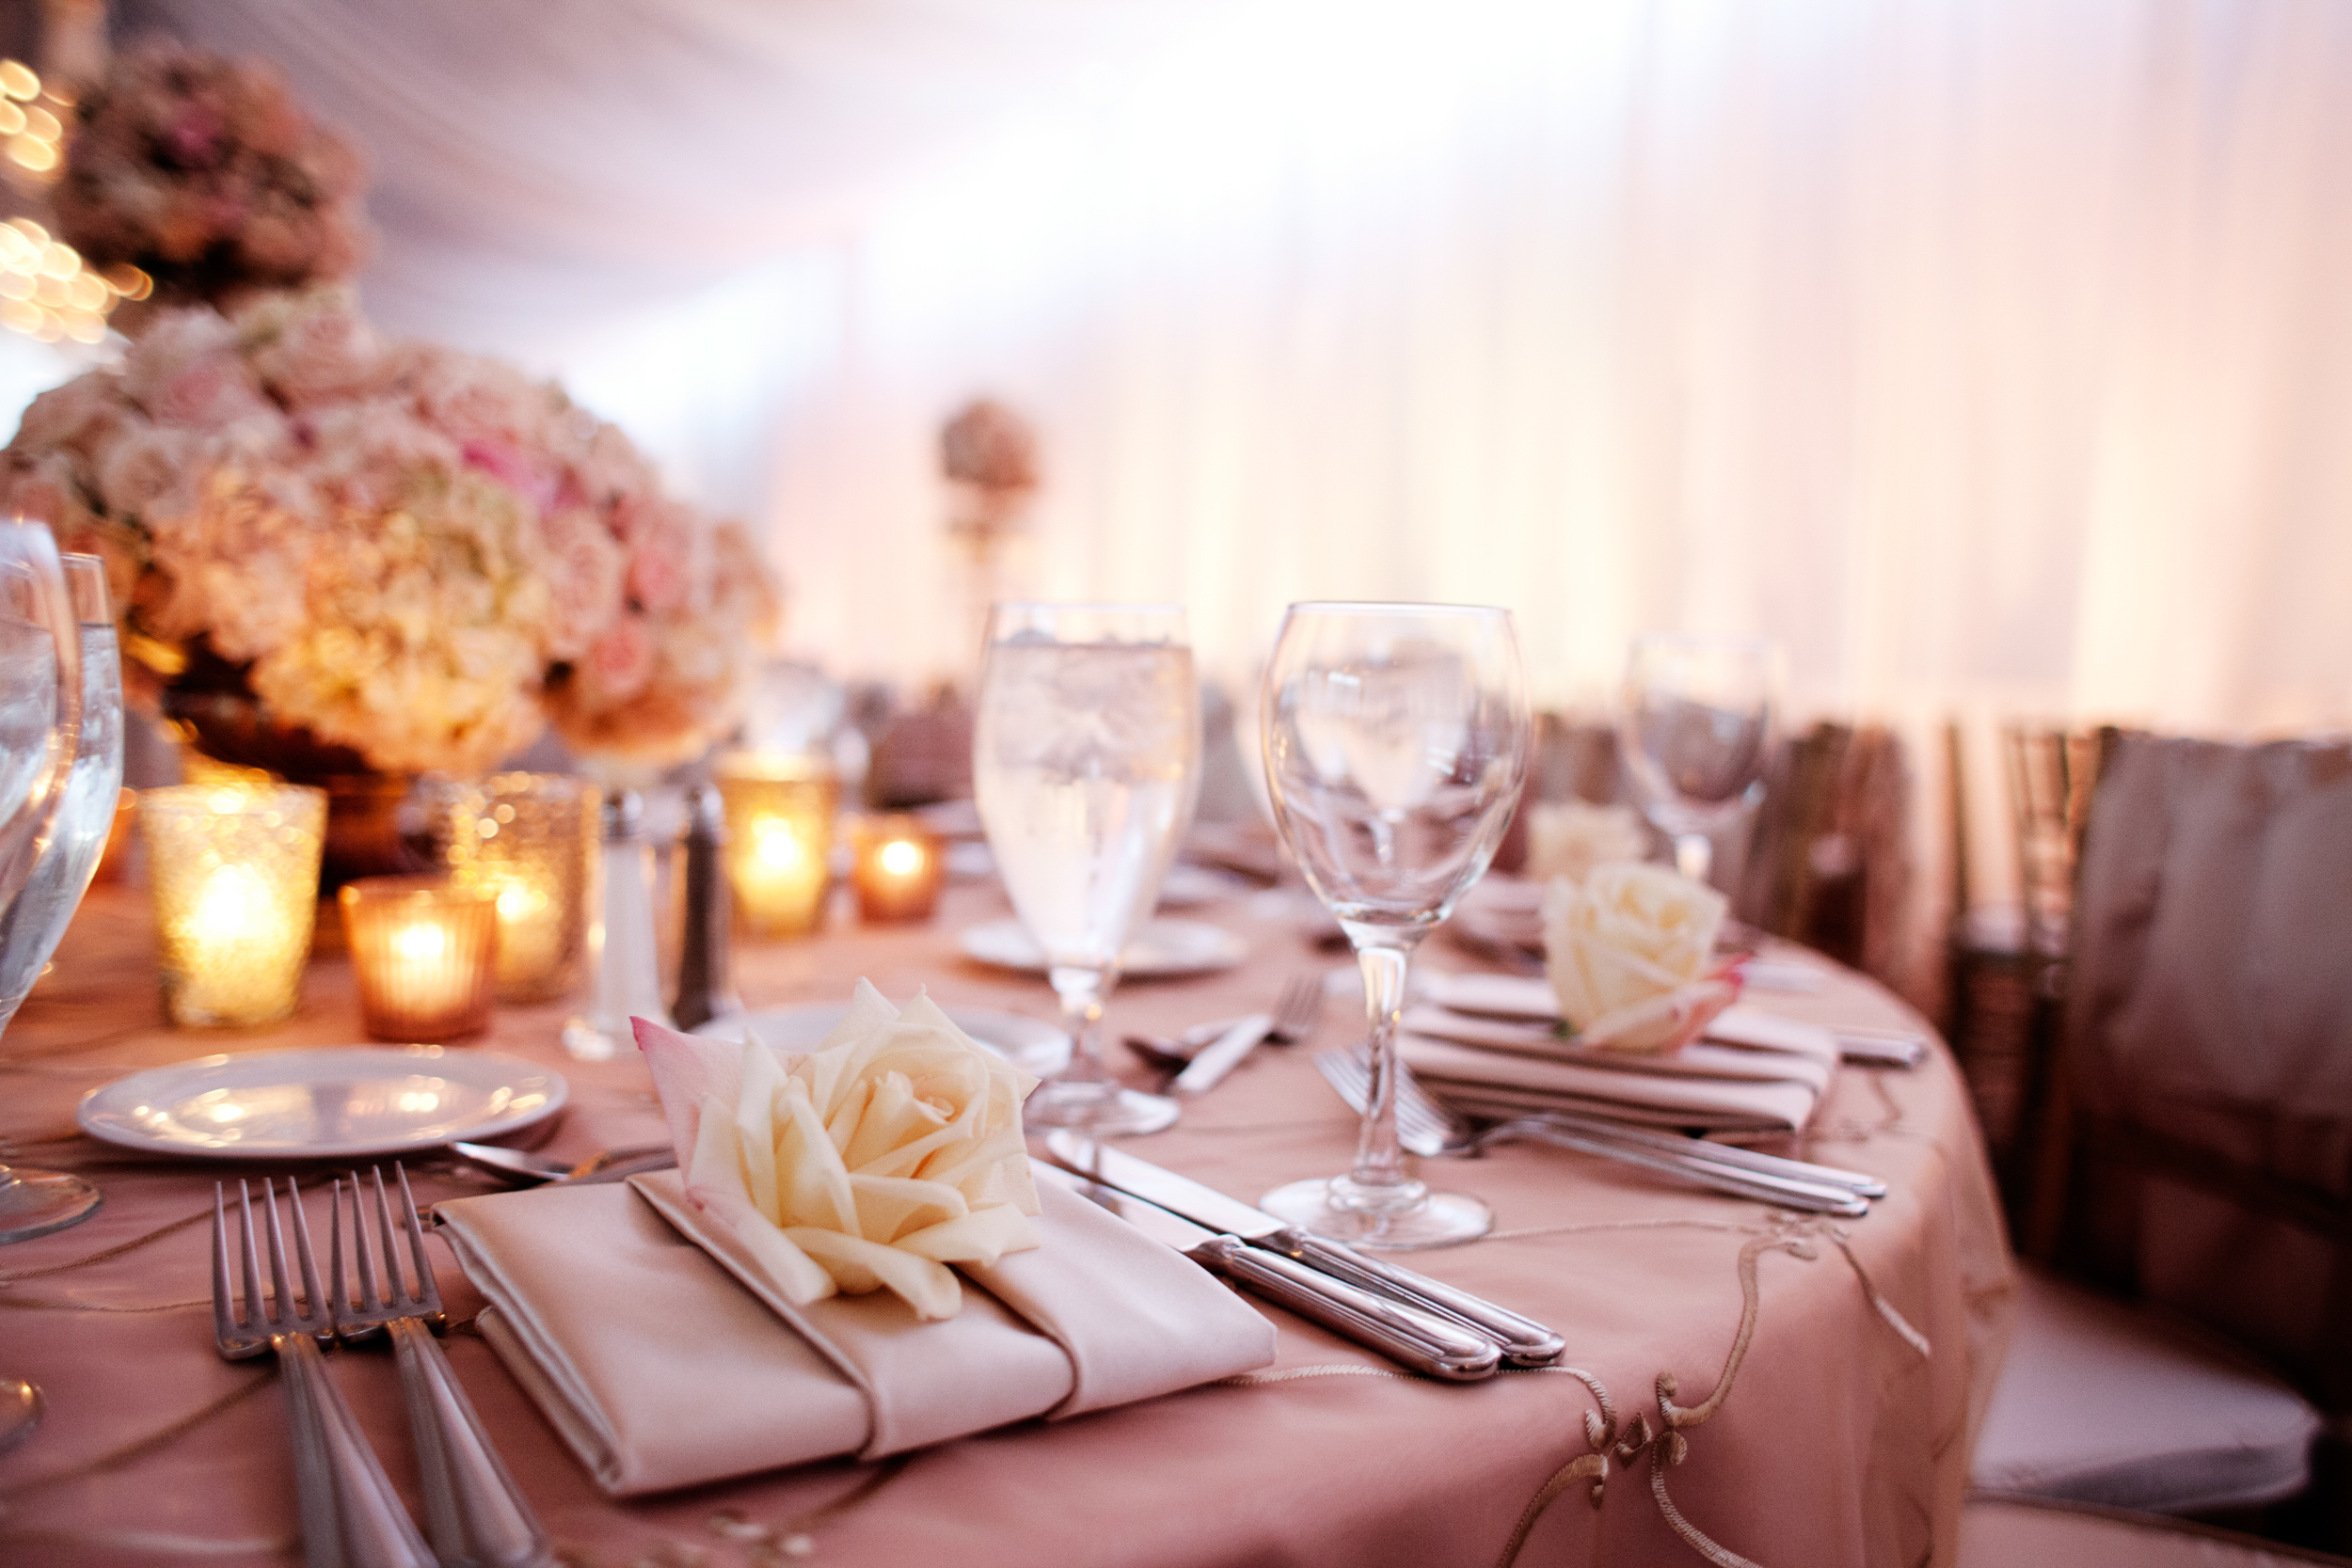 Ceci_New_York_Ceci_Style_Ceci_Johnson_Luxury_Lifestyle_Floral_Lace_Wedding_Letterpress_Inspiration_Design_Custom_Couture_Personalized_Invitations_-66.jpg